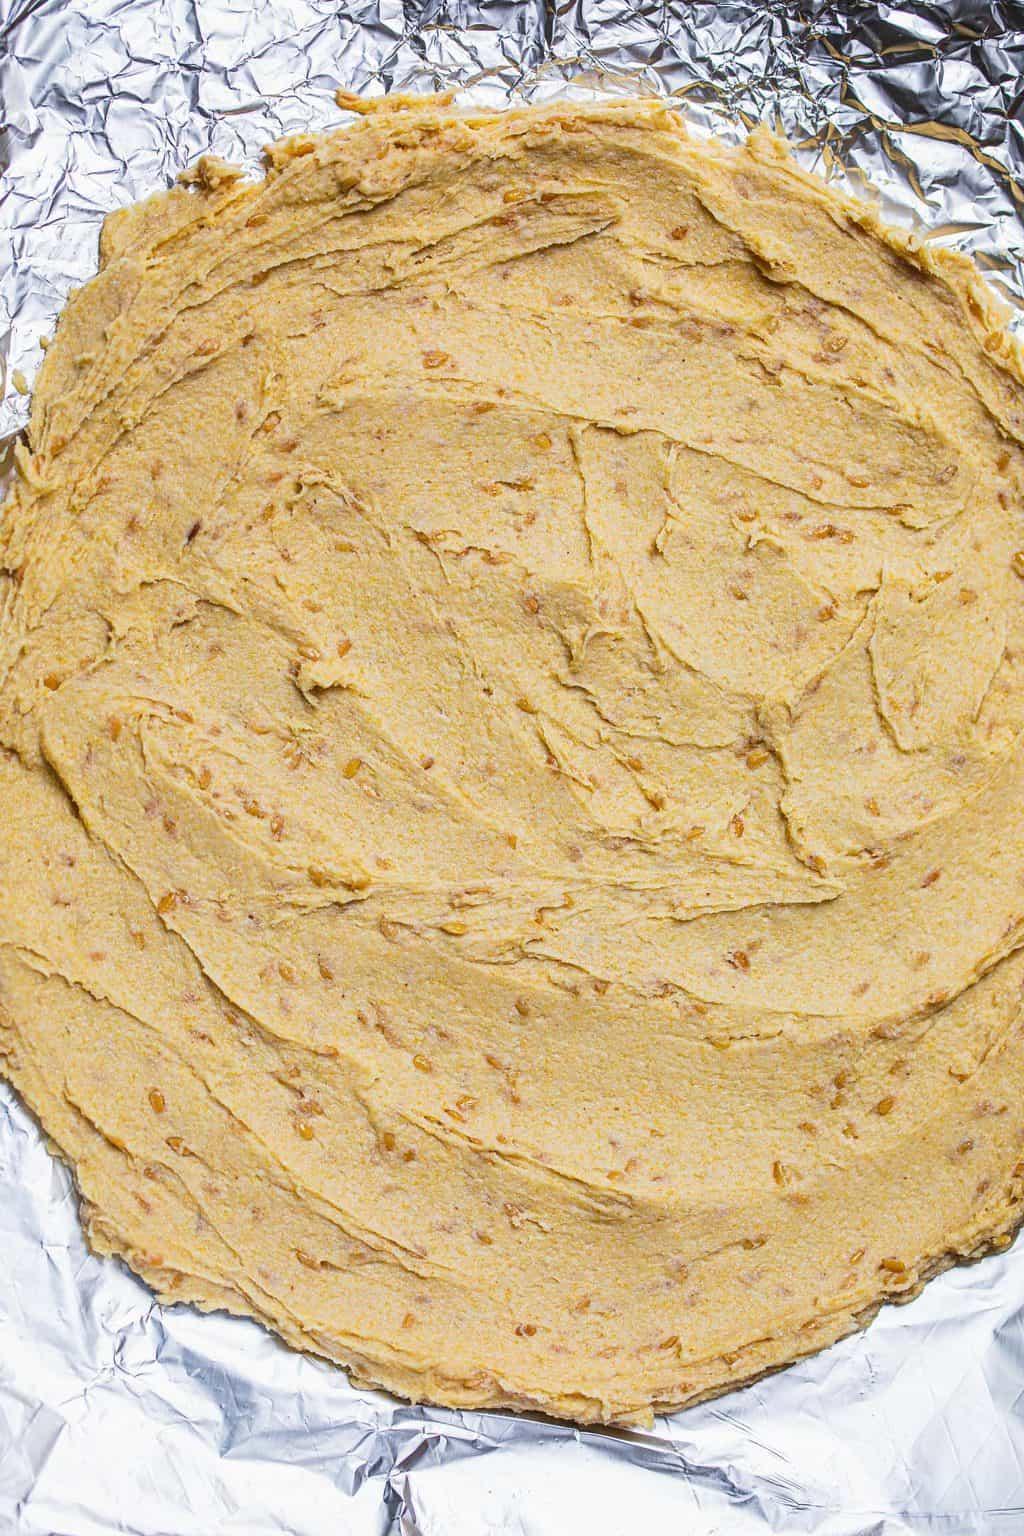 Unbaked gluten-free vegan pizza dough